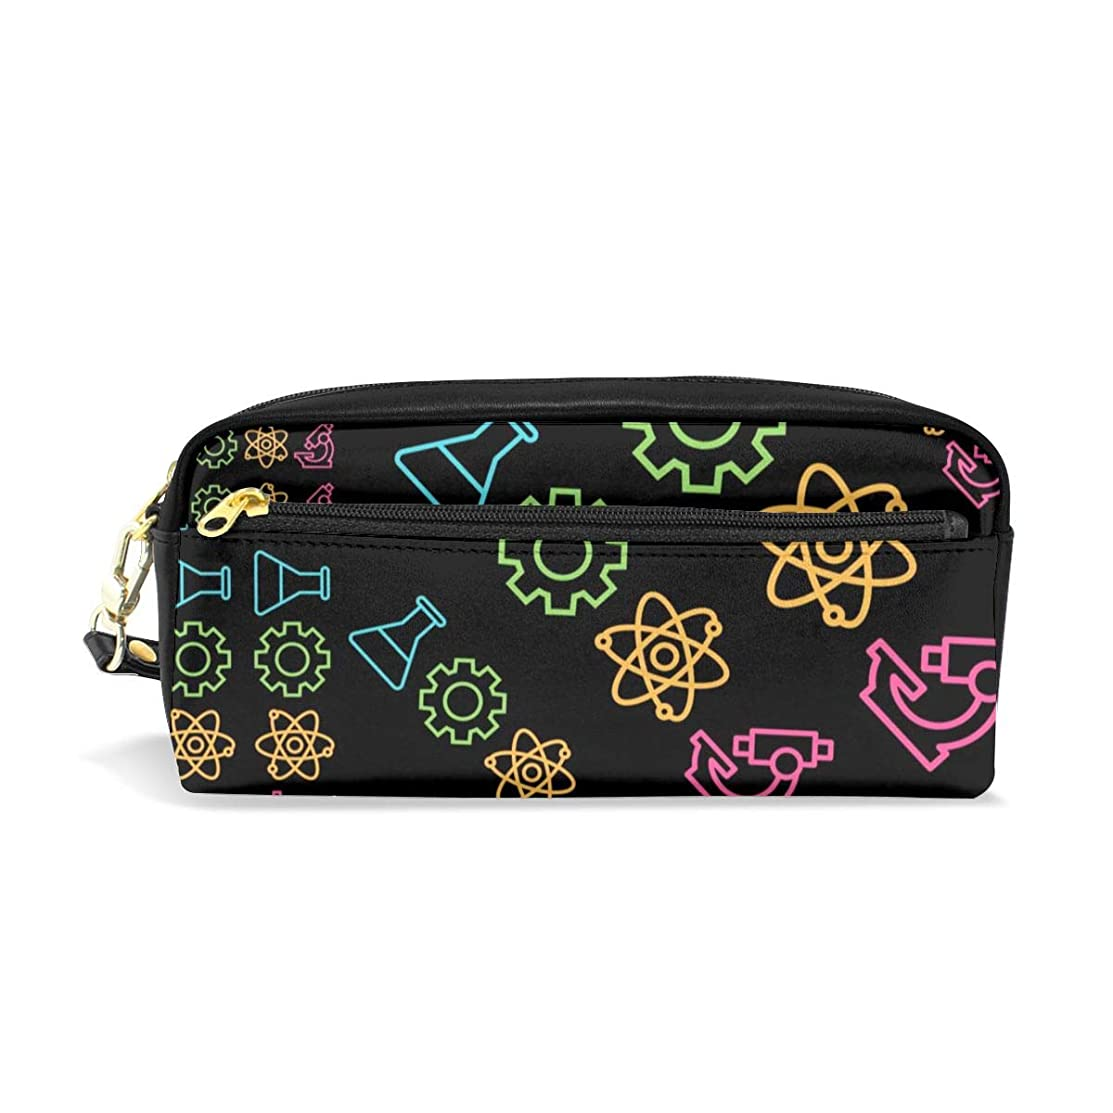 Multifunction Durable Cosmetic Bag Science Elements Pencil Bag Pouch Bag Case Makeup Bag